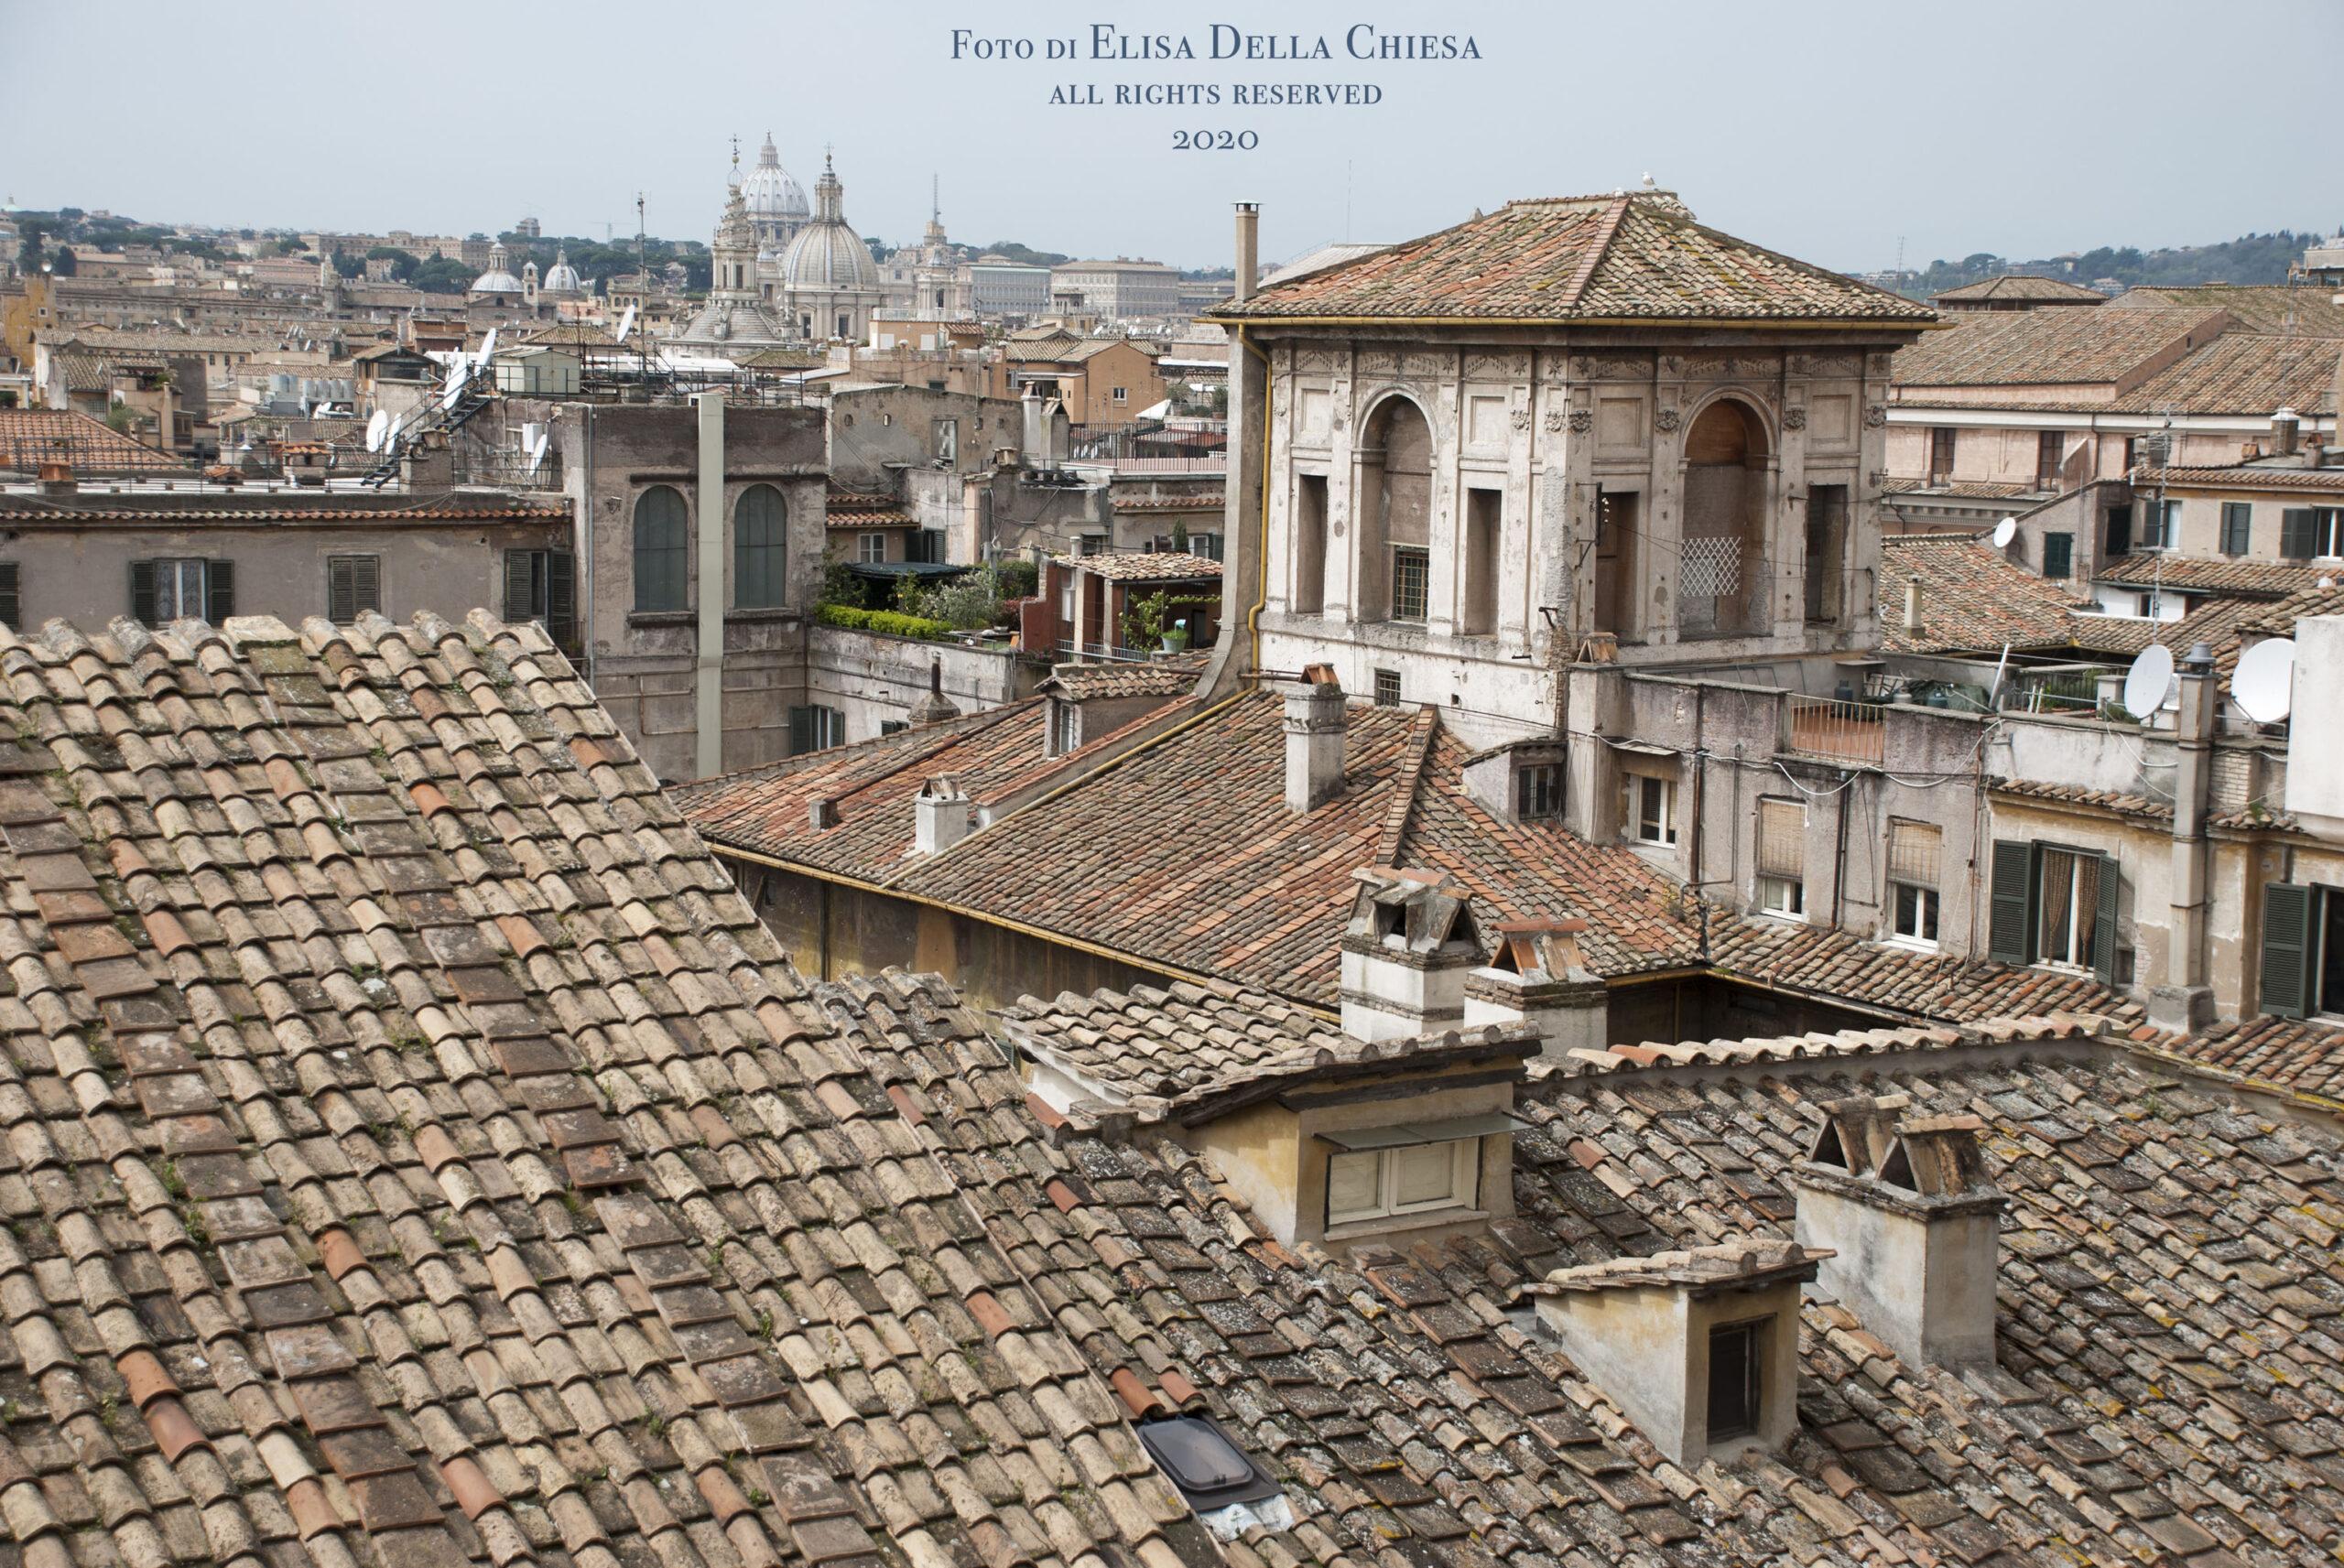 https://www.elisadellachiesa.it/wp-content/uploads/2020/02/Tetti-di-Roma-scaled.jpg